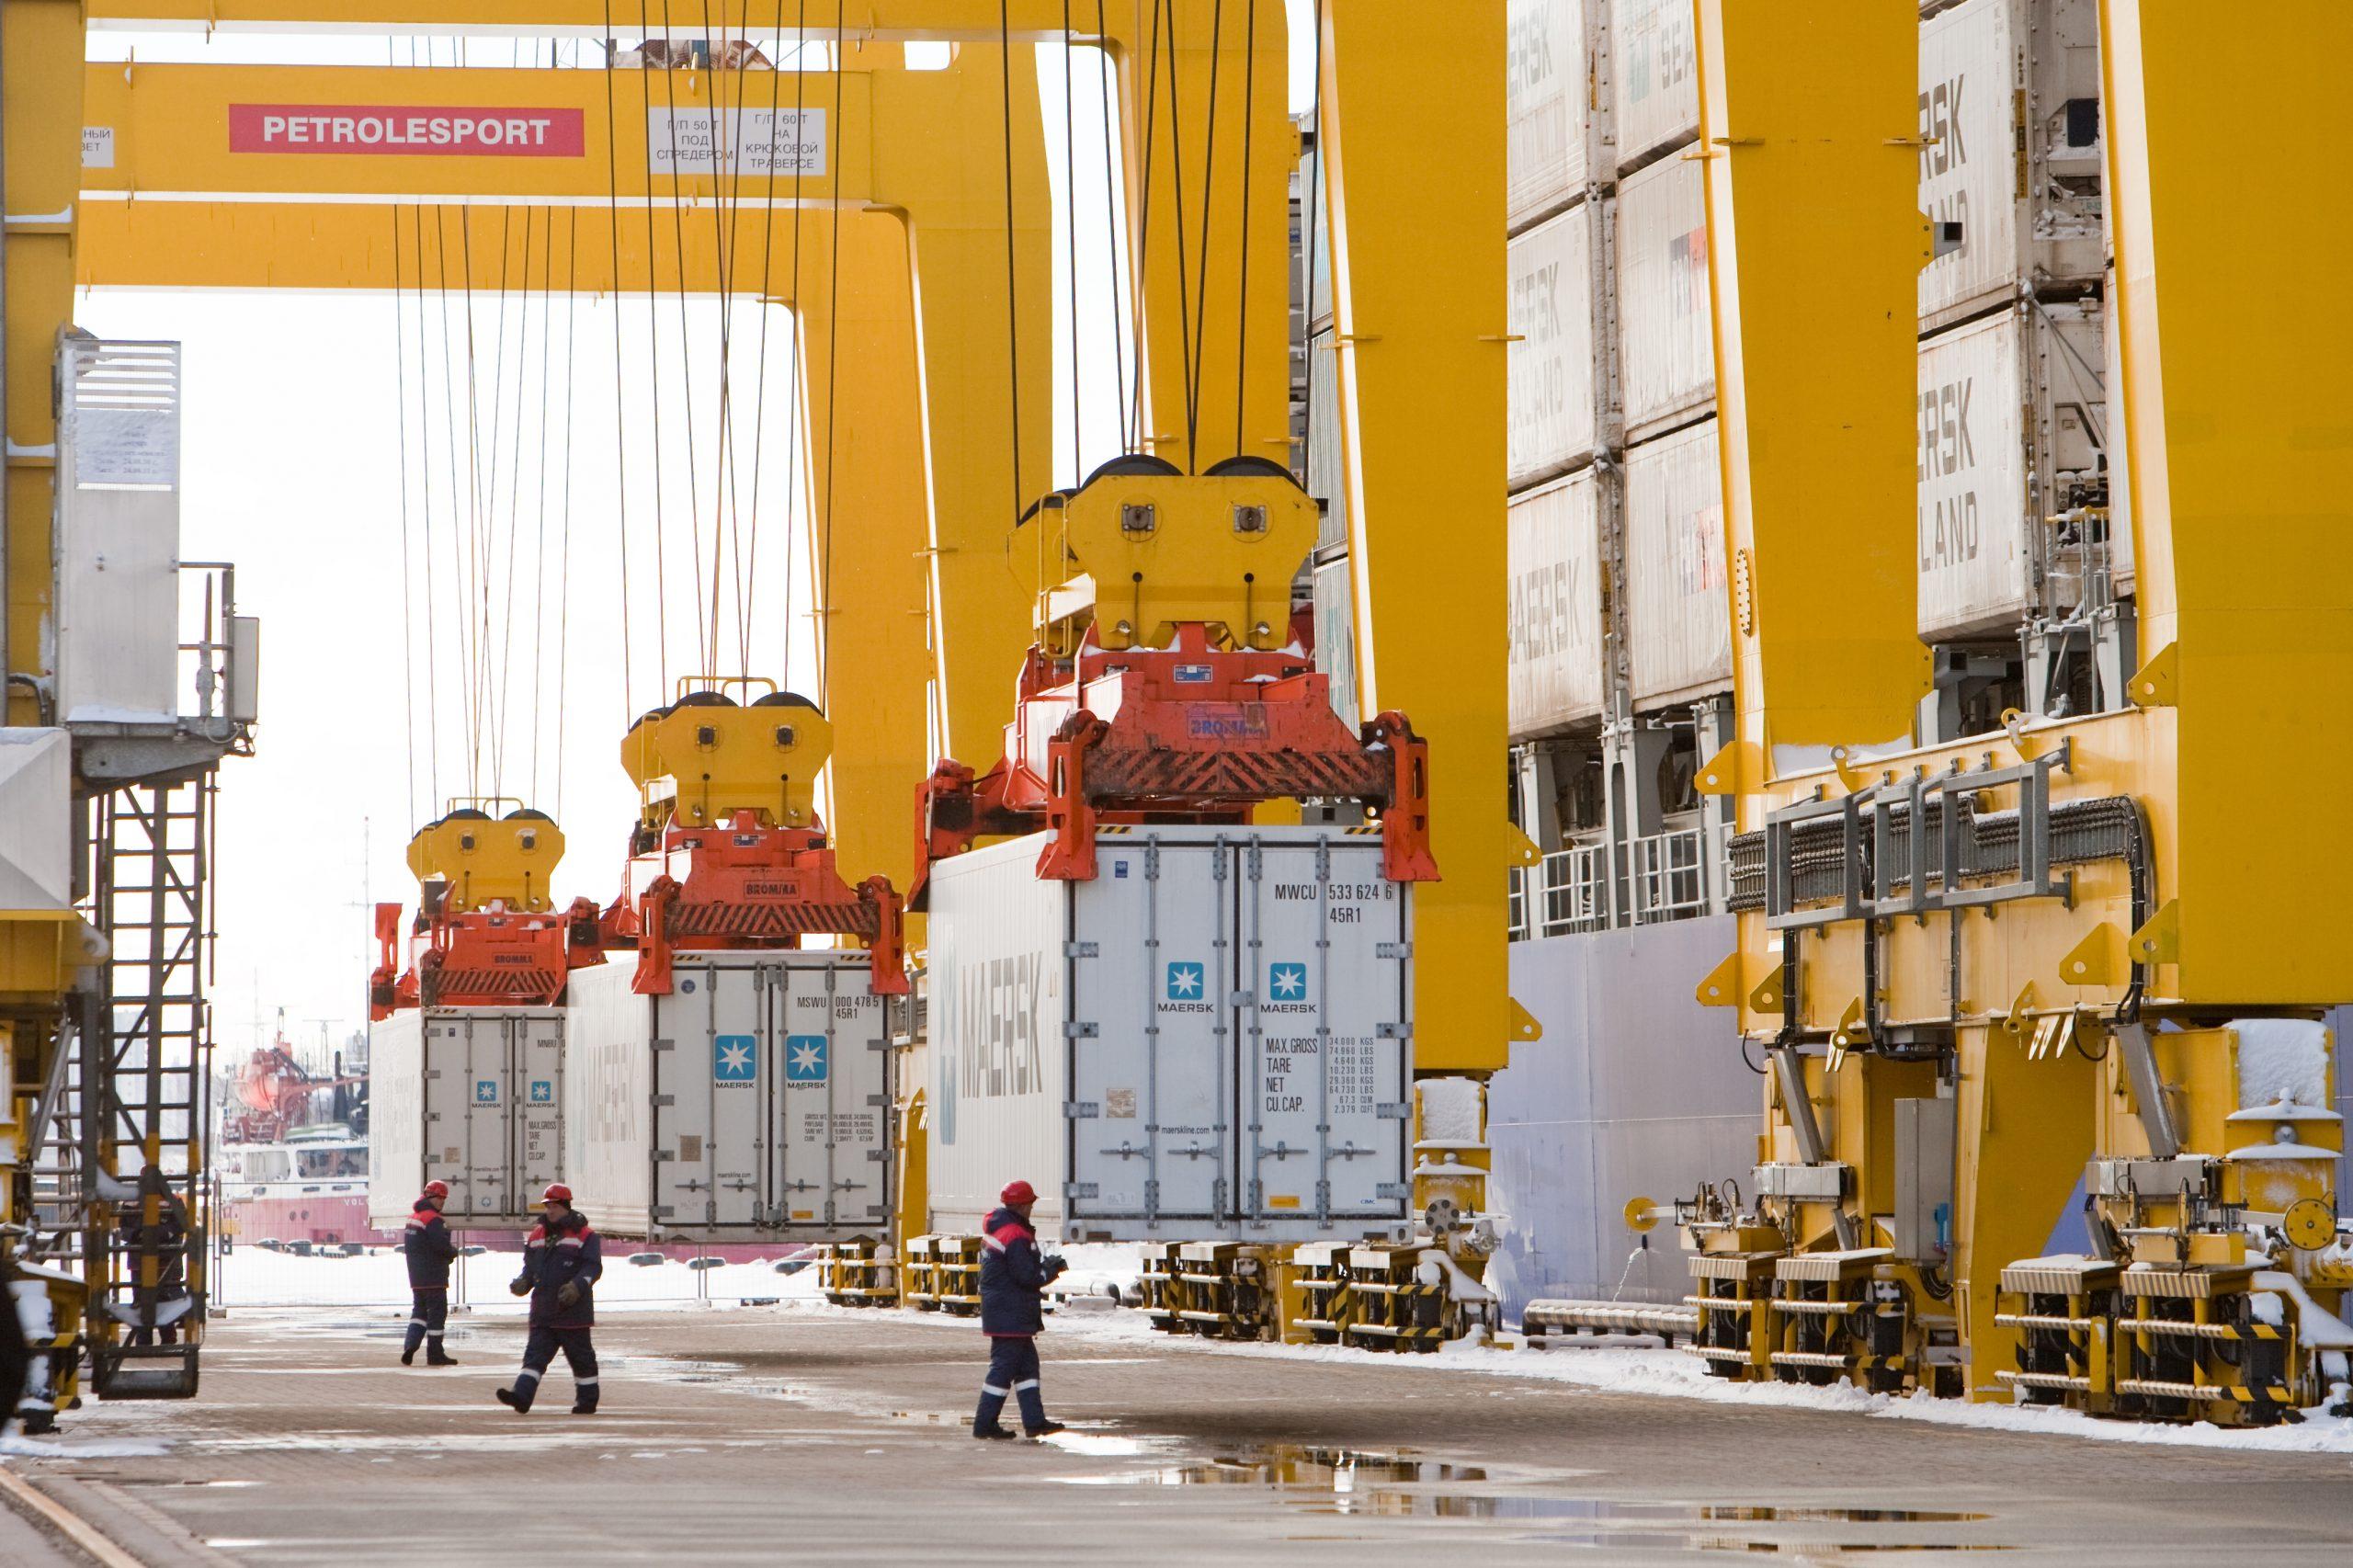 Контейнерооборот морских терминалов Global Ports за I полугодие 2020 г. вырос на 8,4% 1